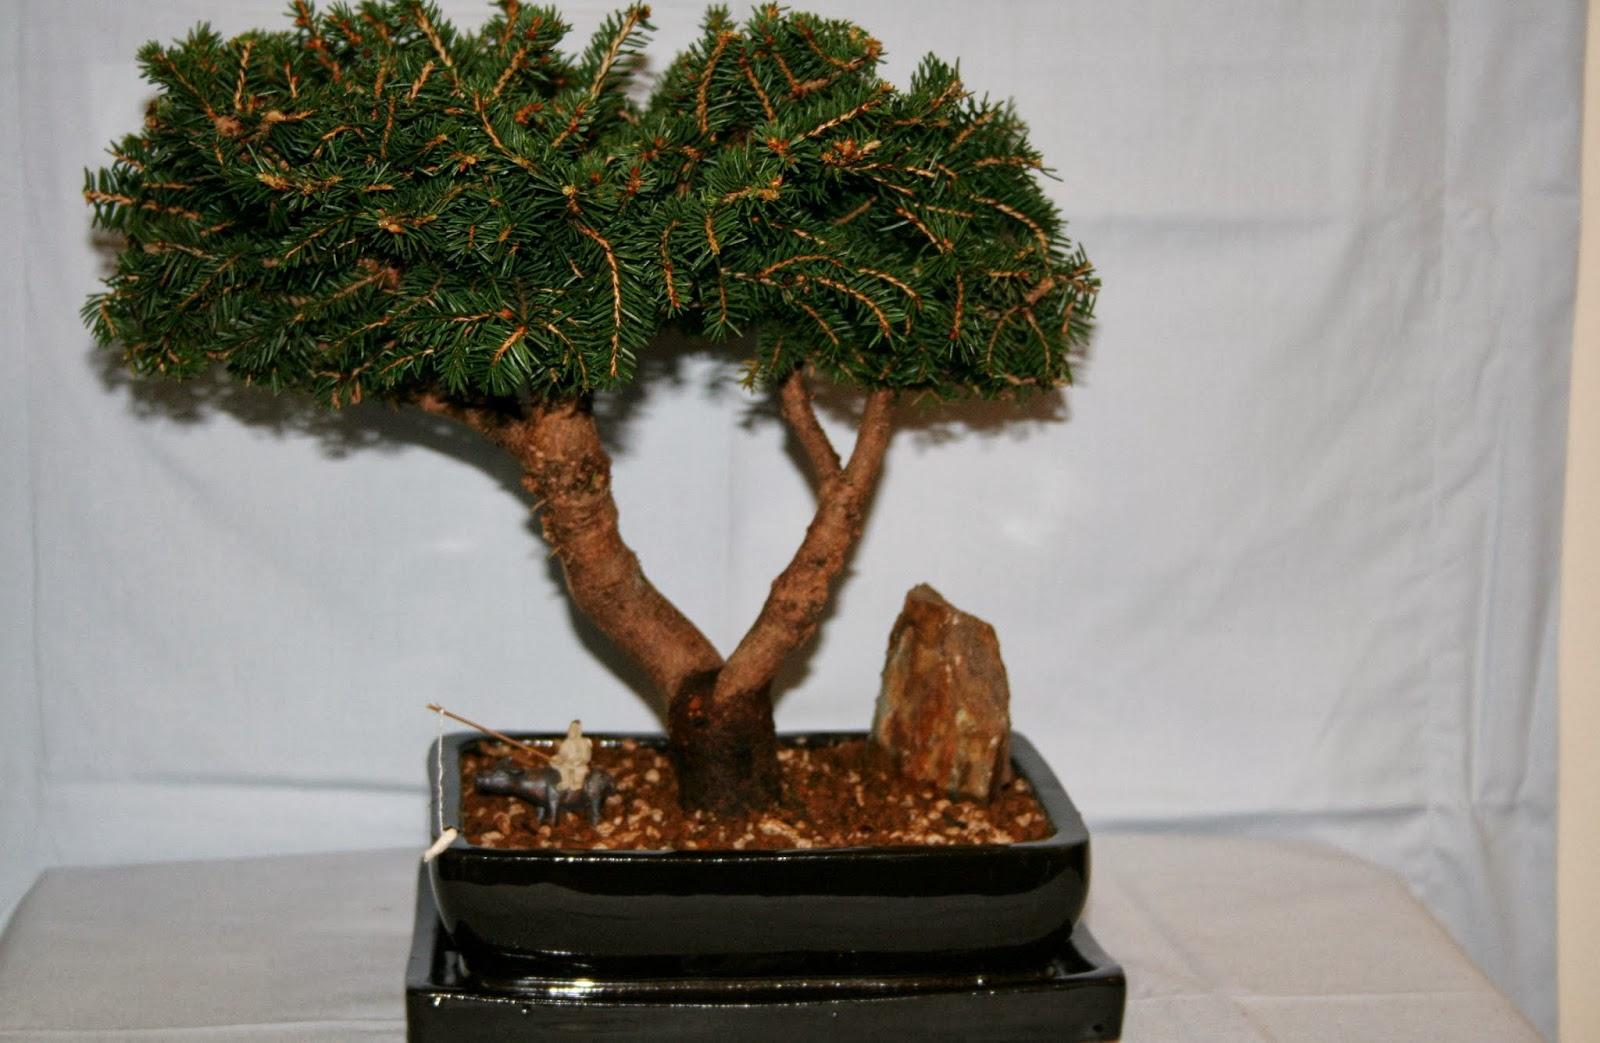 Yoji Bonsai Canada Bonsai Trees Available For Sale